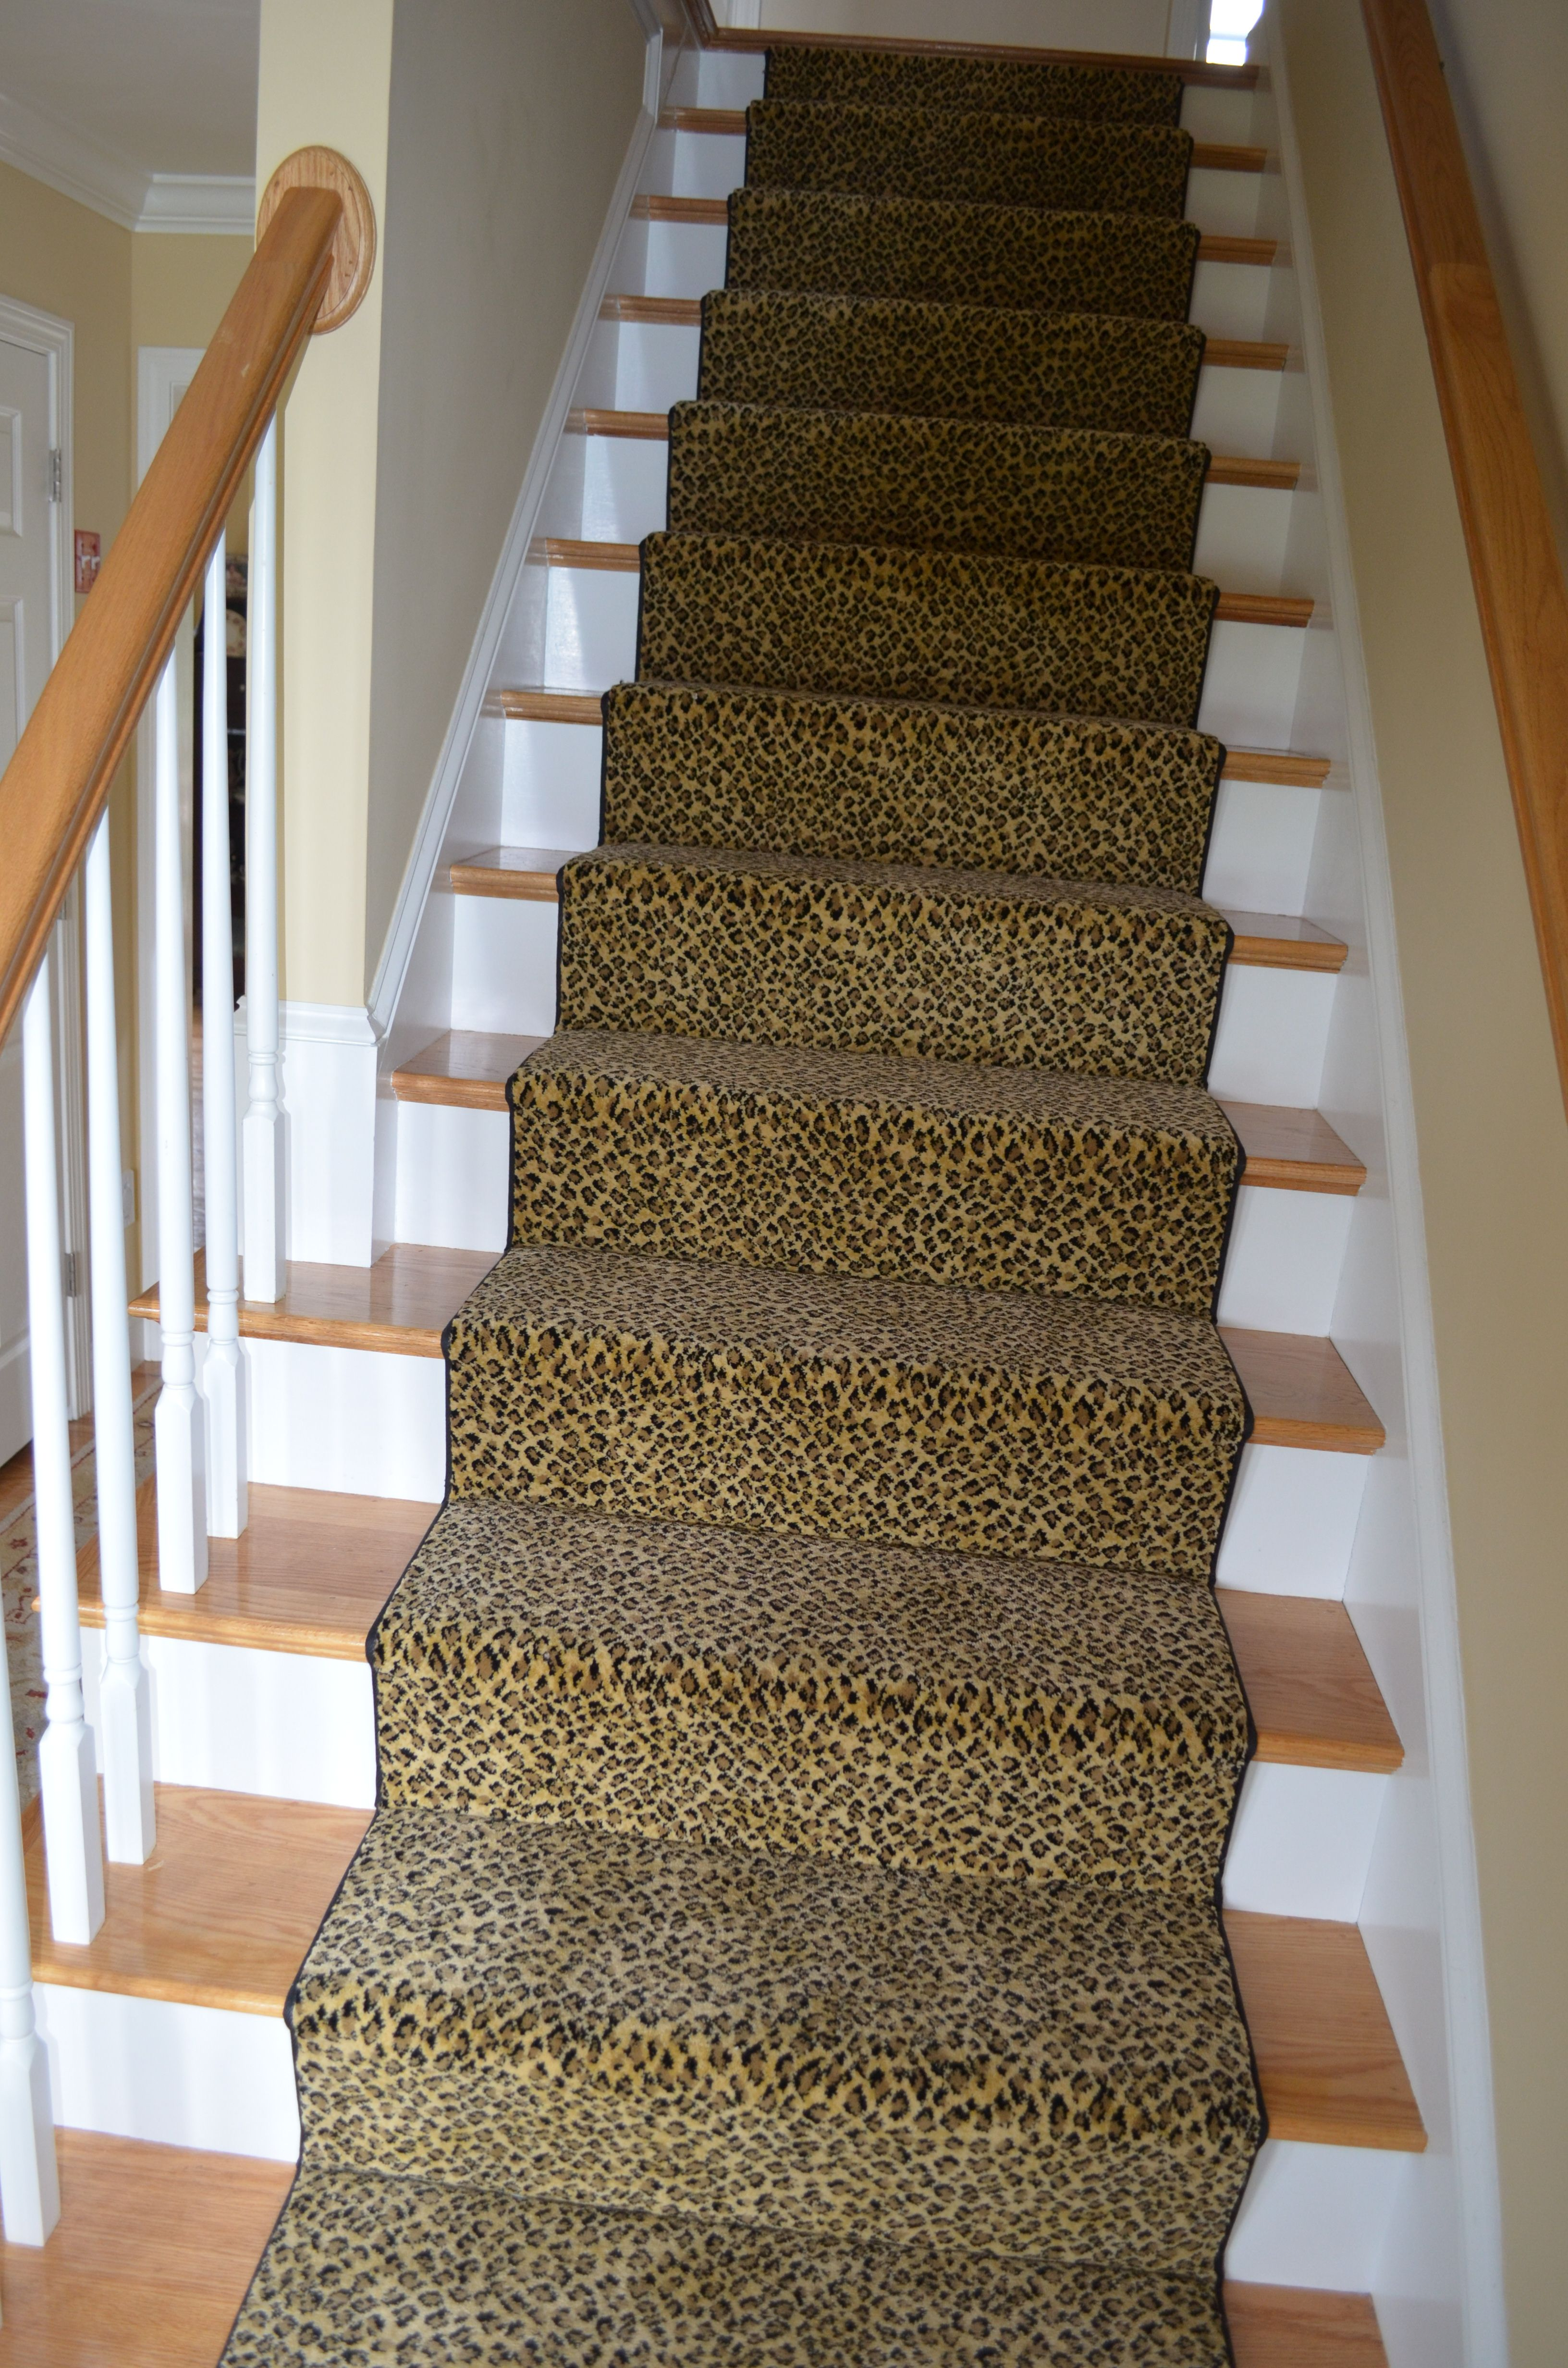 Cheetah Print Stair Runner Installed In Belmont, Ma. Http://carpetworkroom.